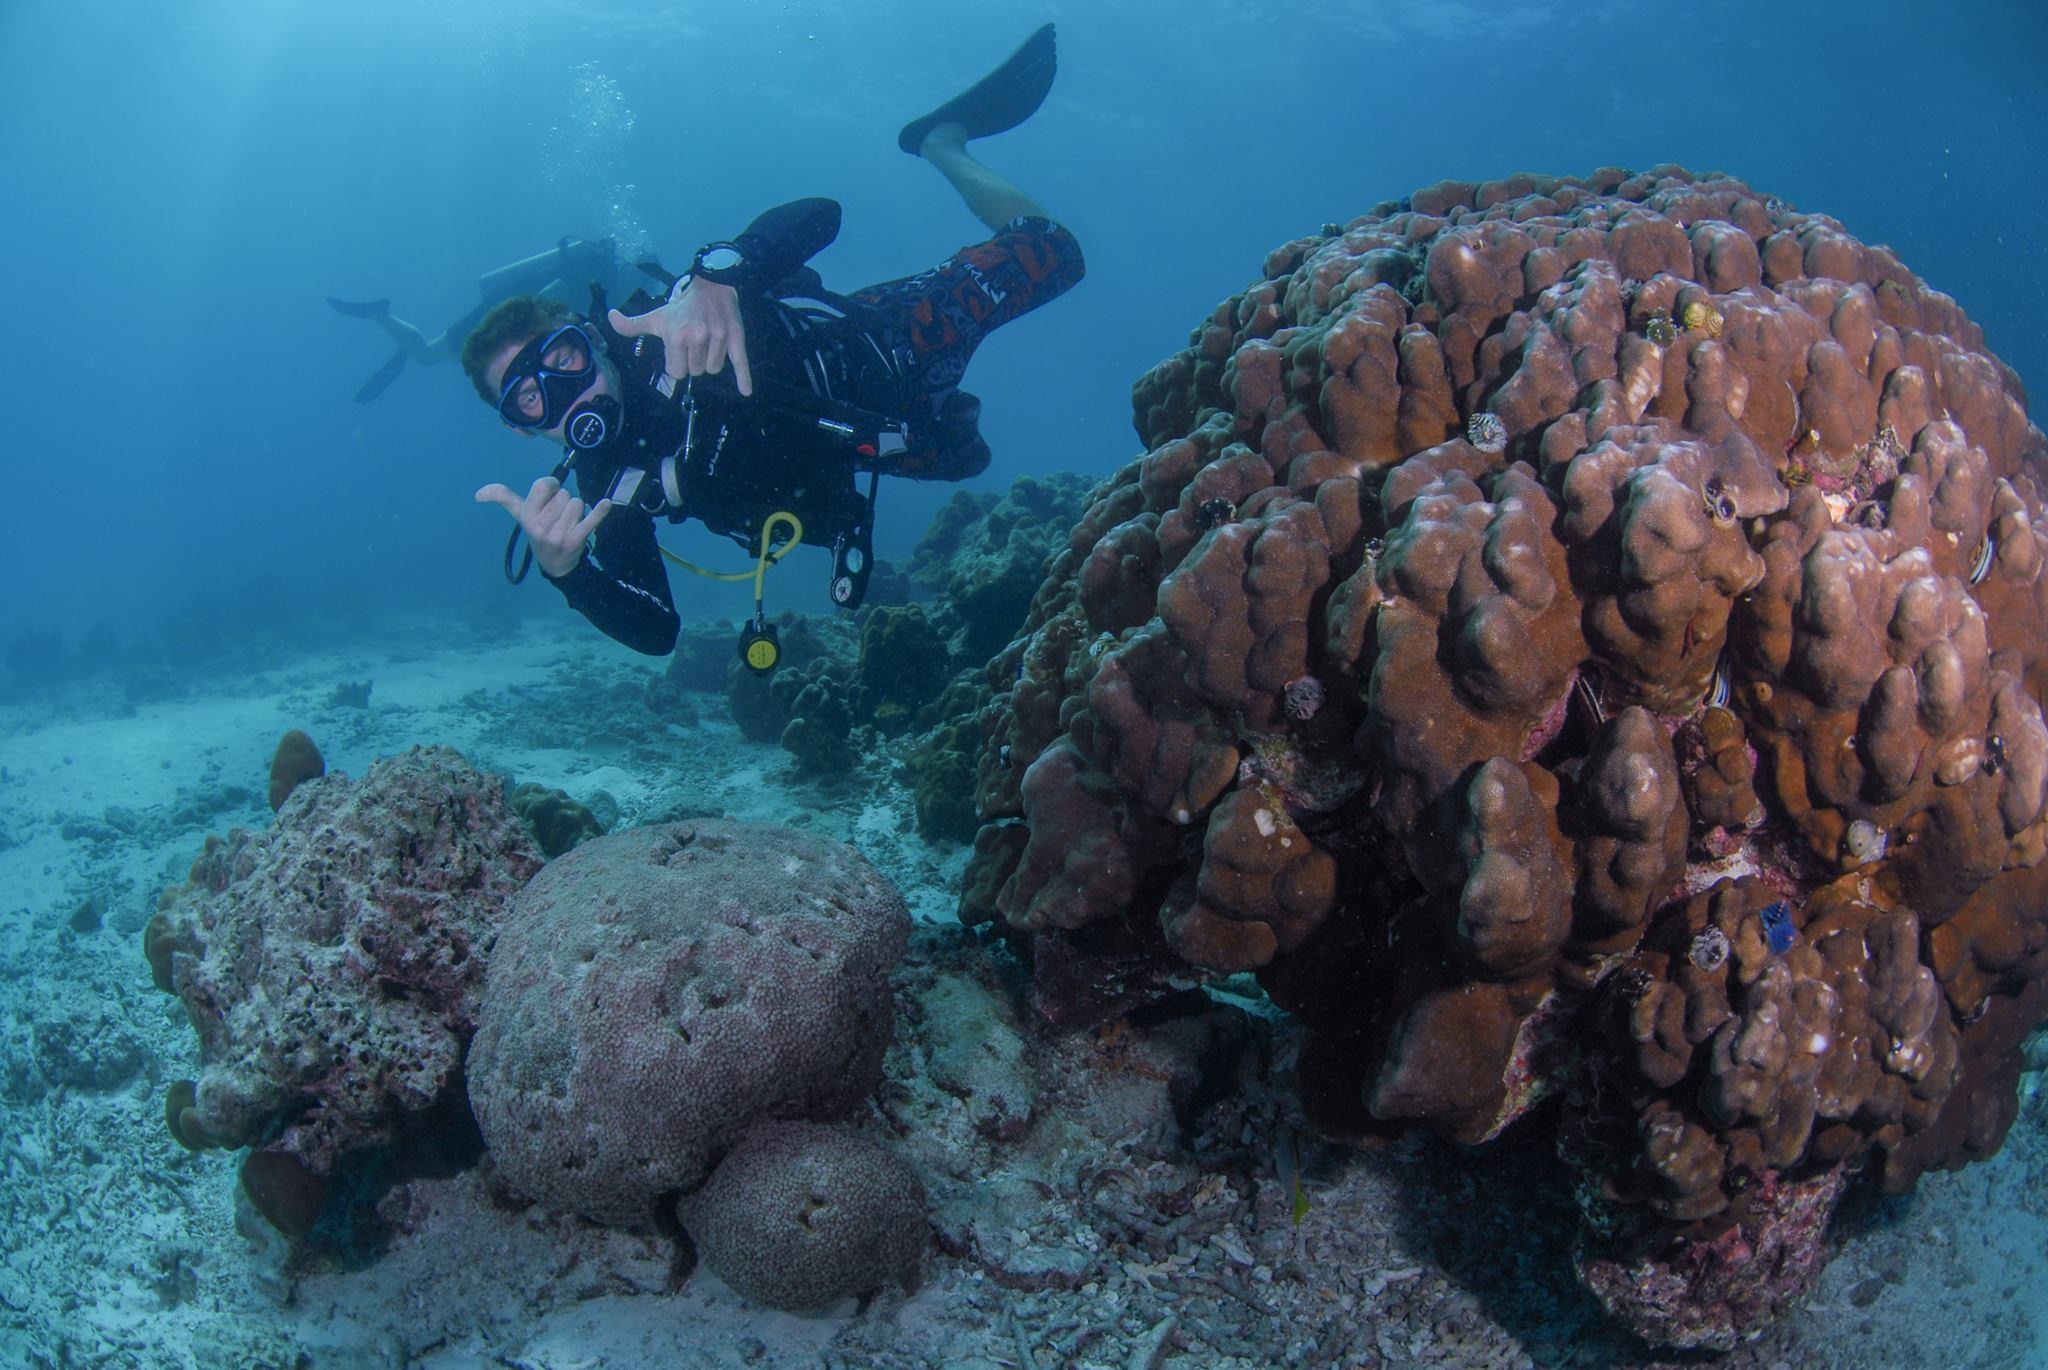 patrik dykning8